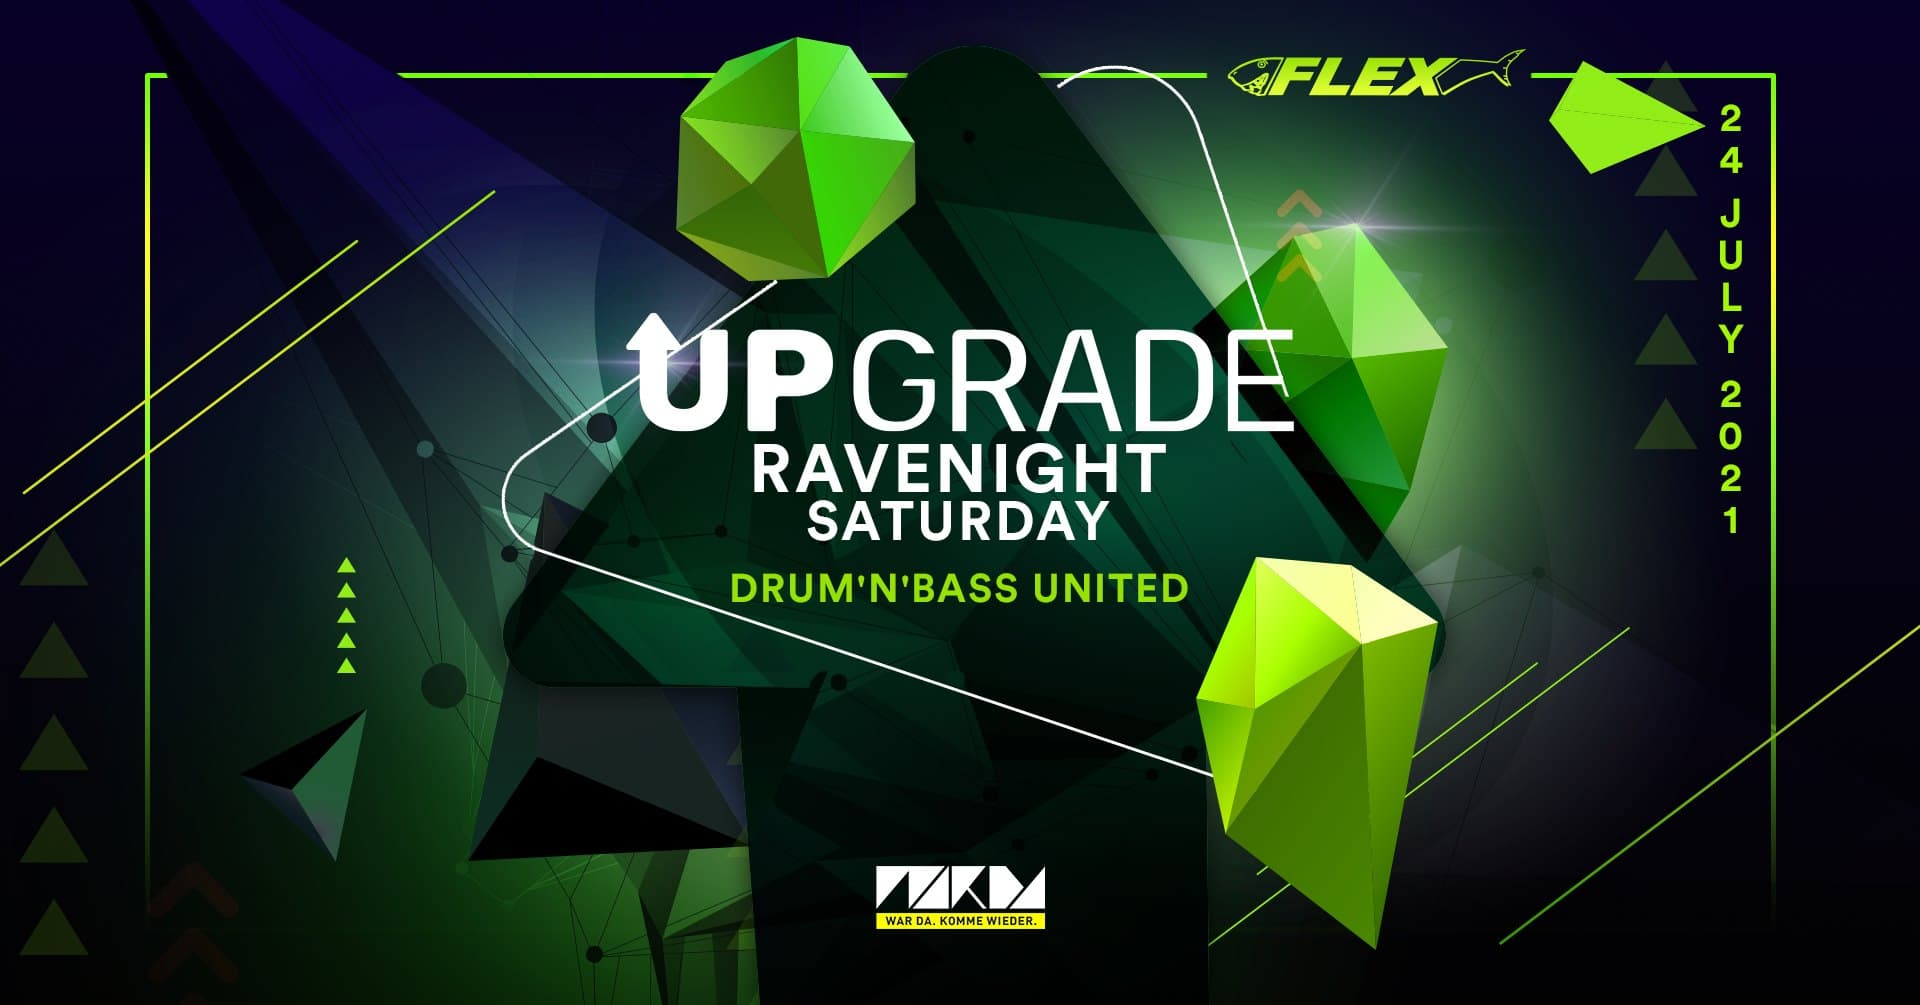 Events Wien: Upgrade Ravenight